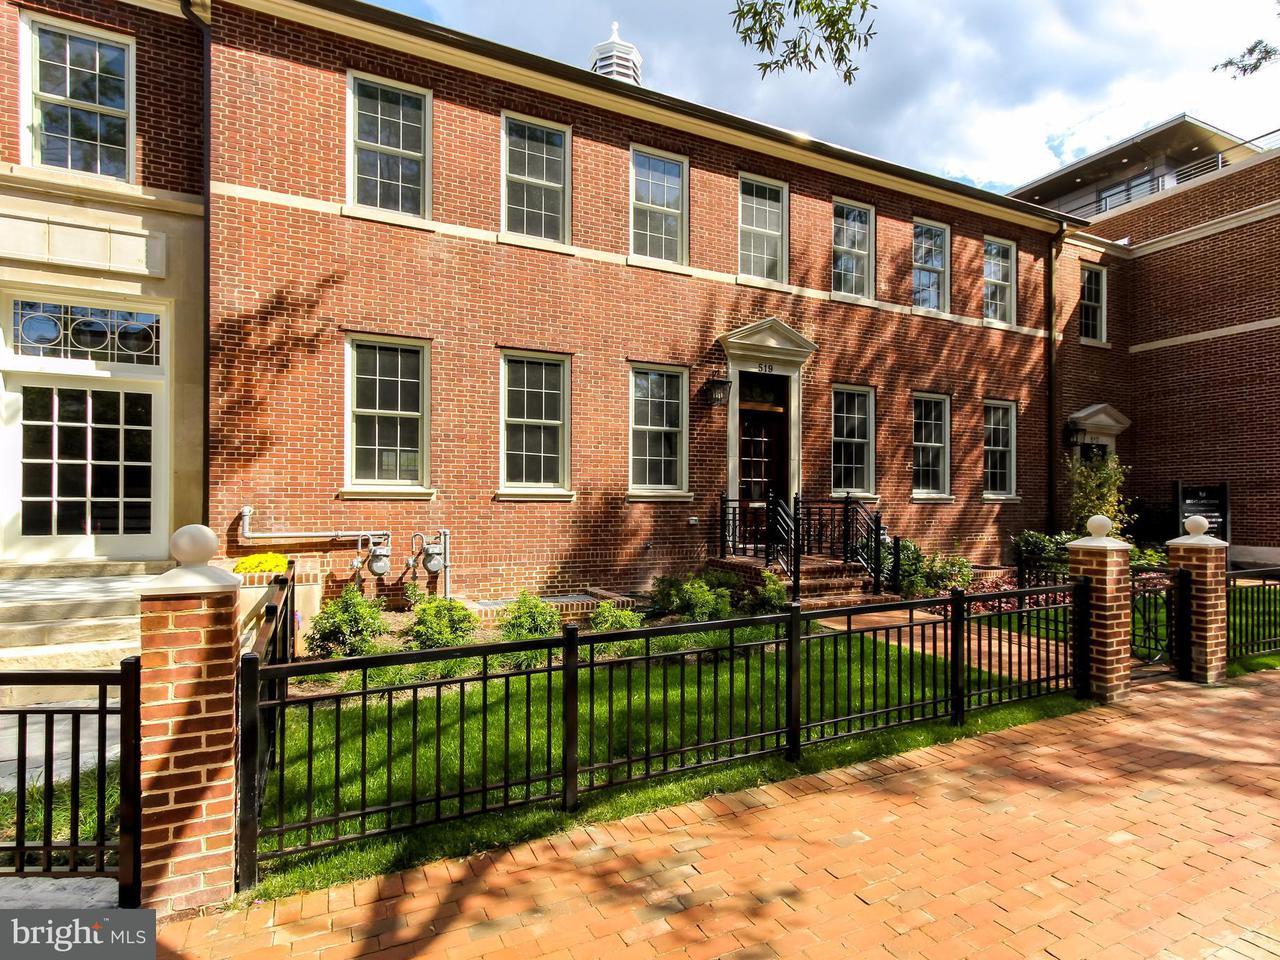 Additional photo for property listing at 519 Saint Asaph St N 519 Saint Asaph St N Alexandria, Virginia 22314 United States